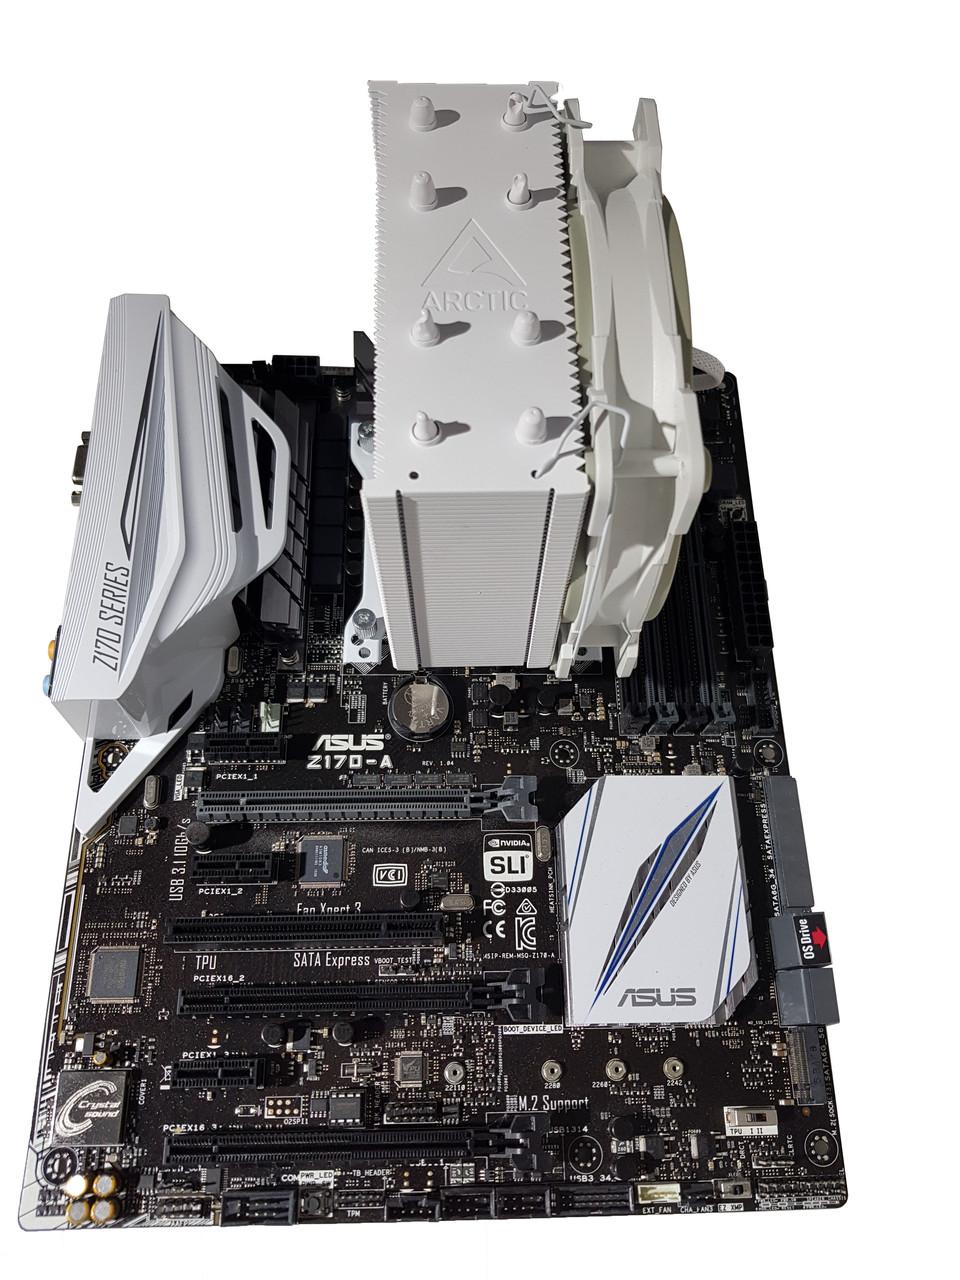 Комплект для апгрейда Asus Z170-A, Intel Core i5-6600k, башня ArcticCool, DDR4 8Gb